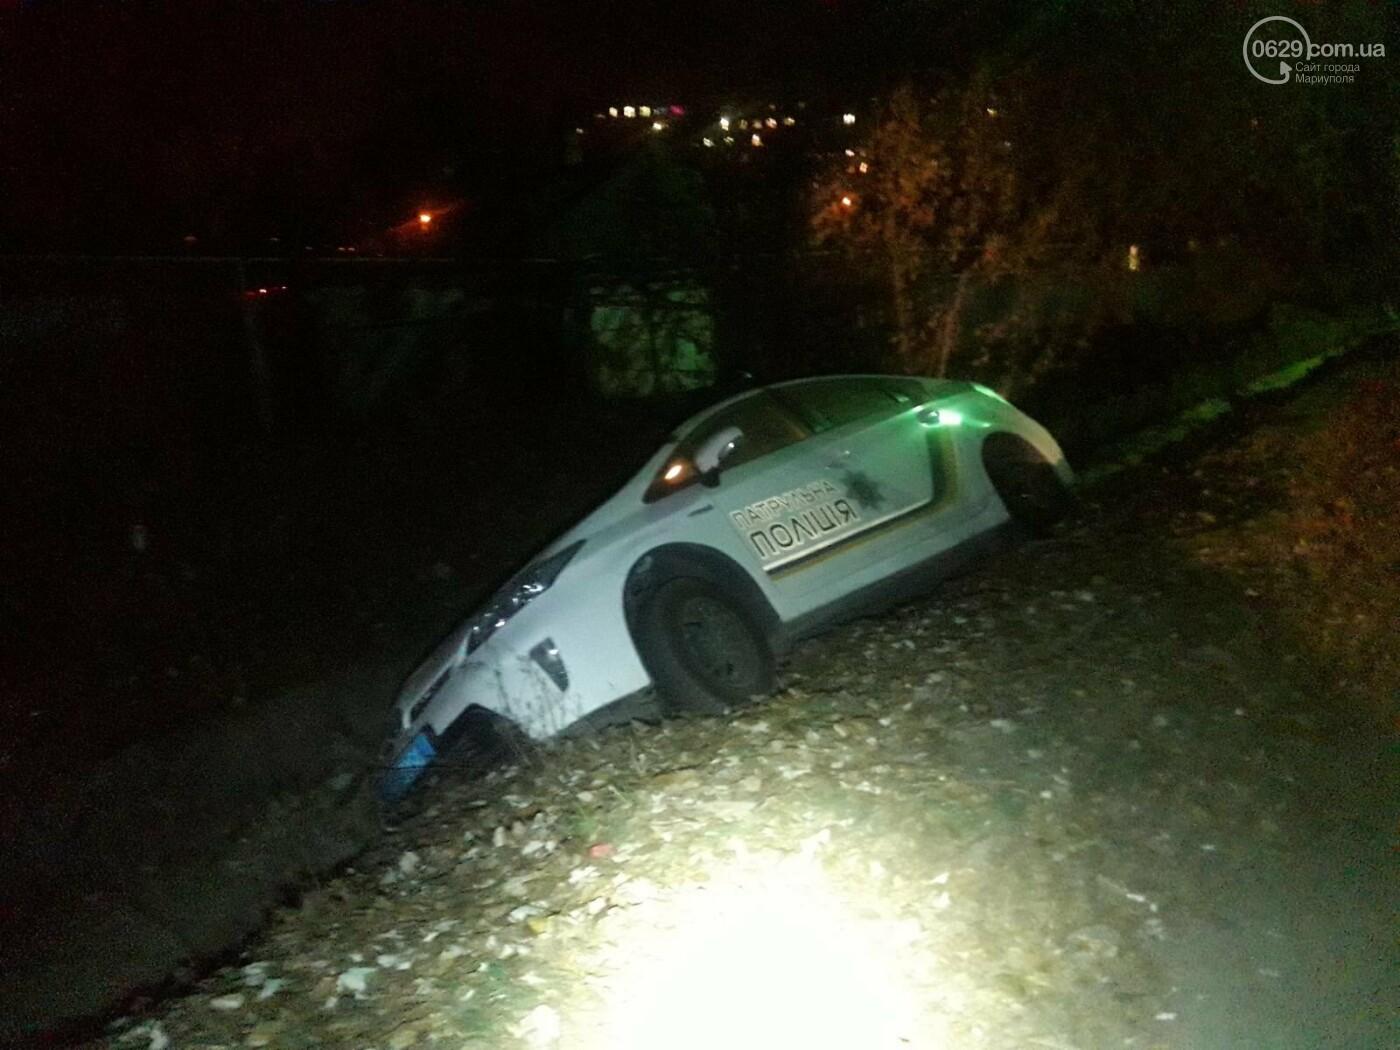 В Мариуполе полицейский автомобиль съехал в кювет,-ФОТО, фото-3